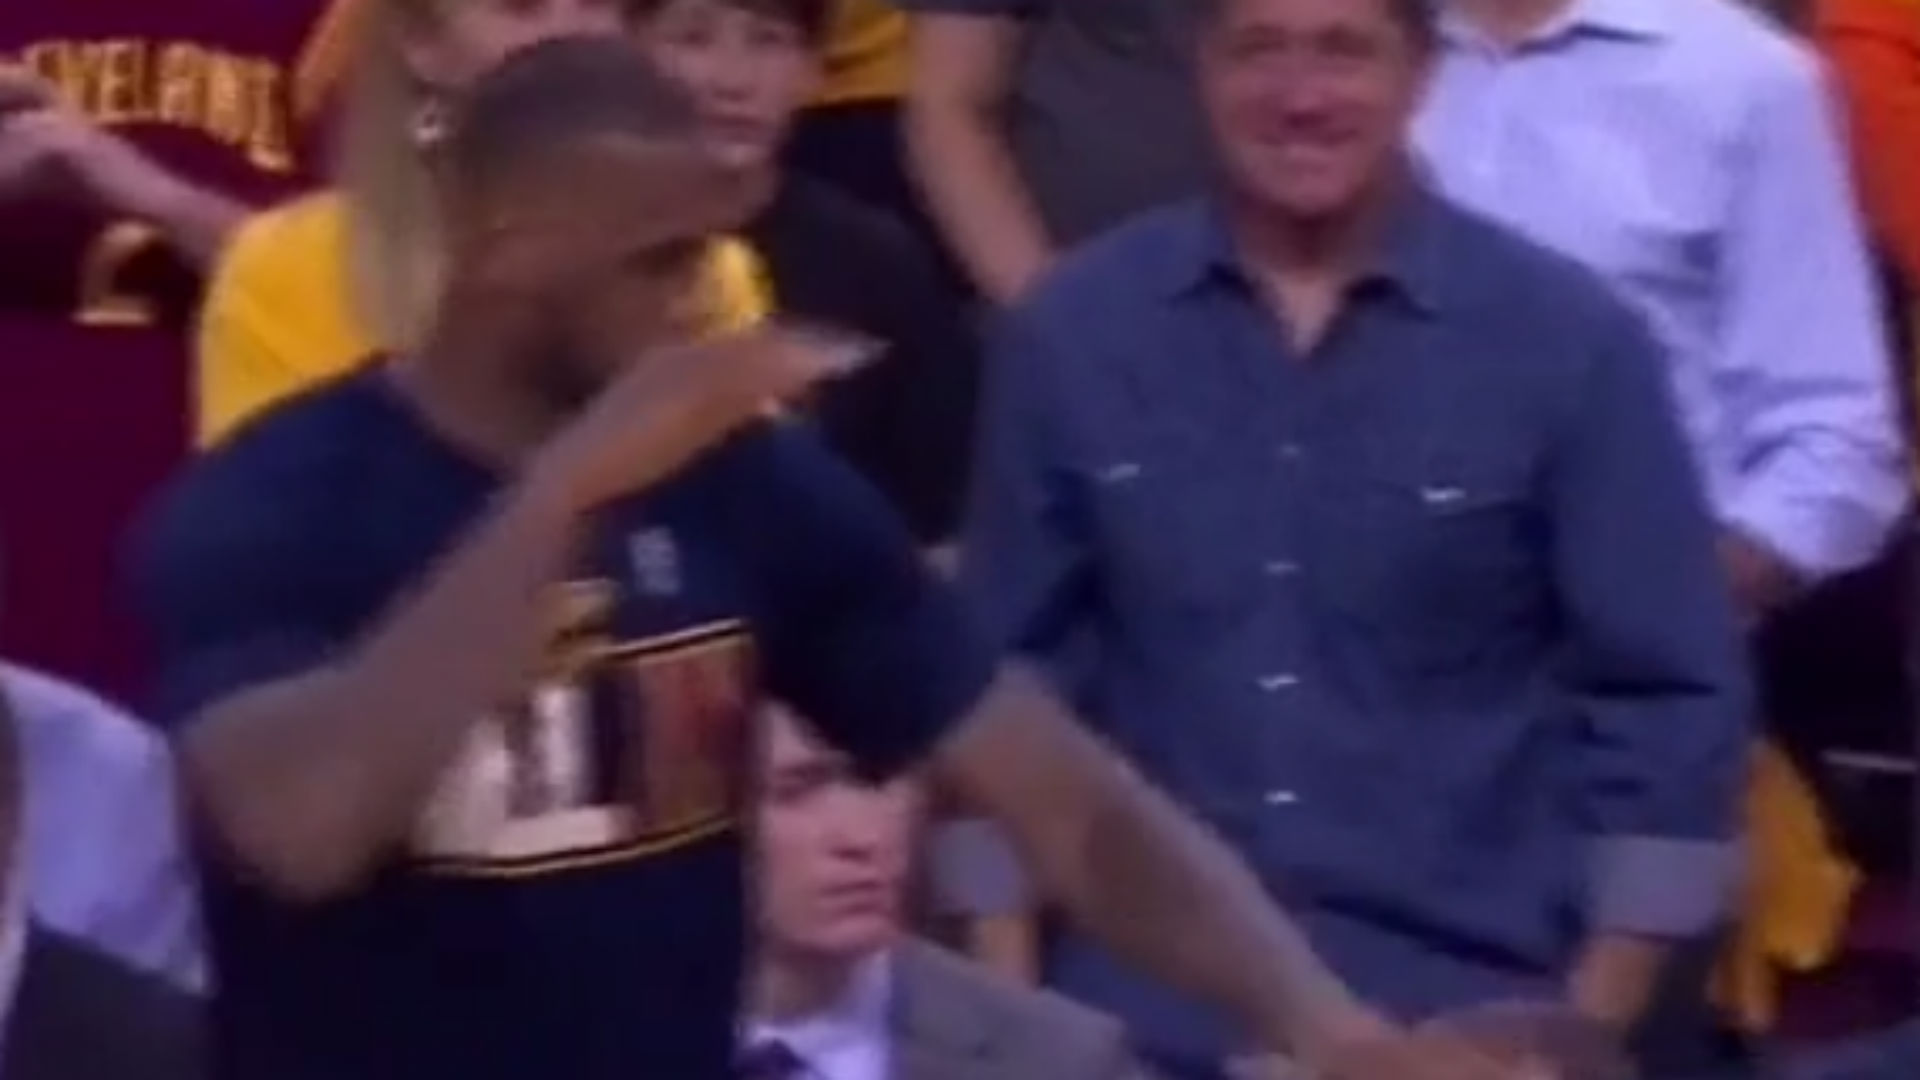 David Blatt leaves LeBron James hanging on handshake attempt following Cavs' win